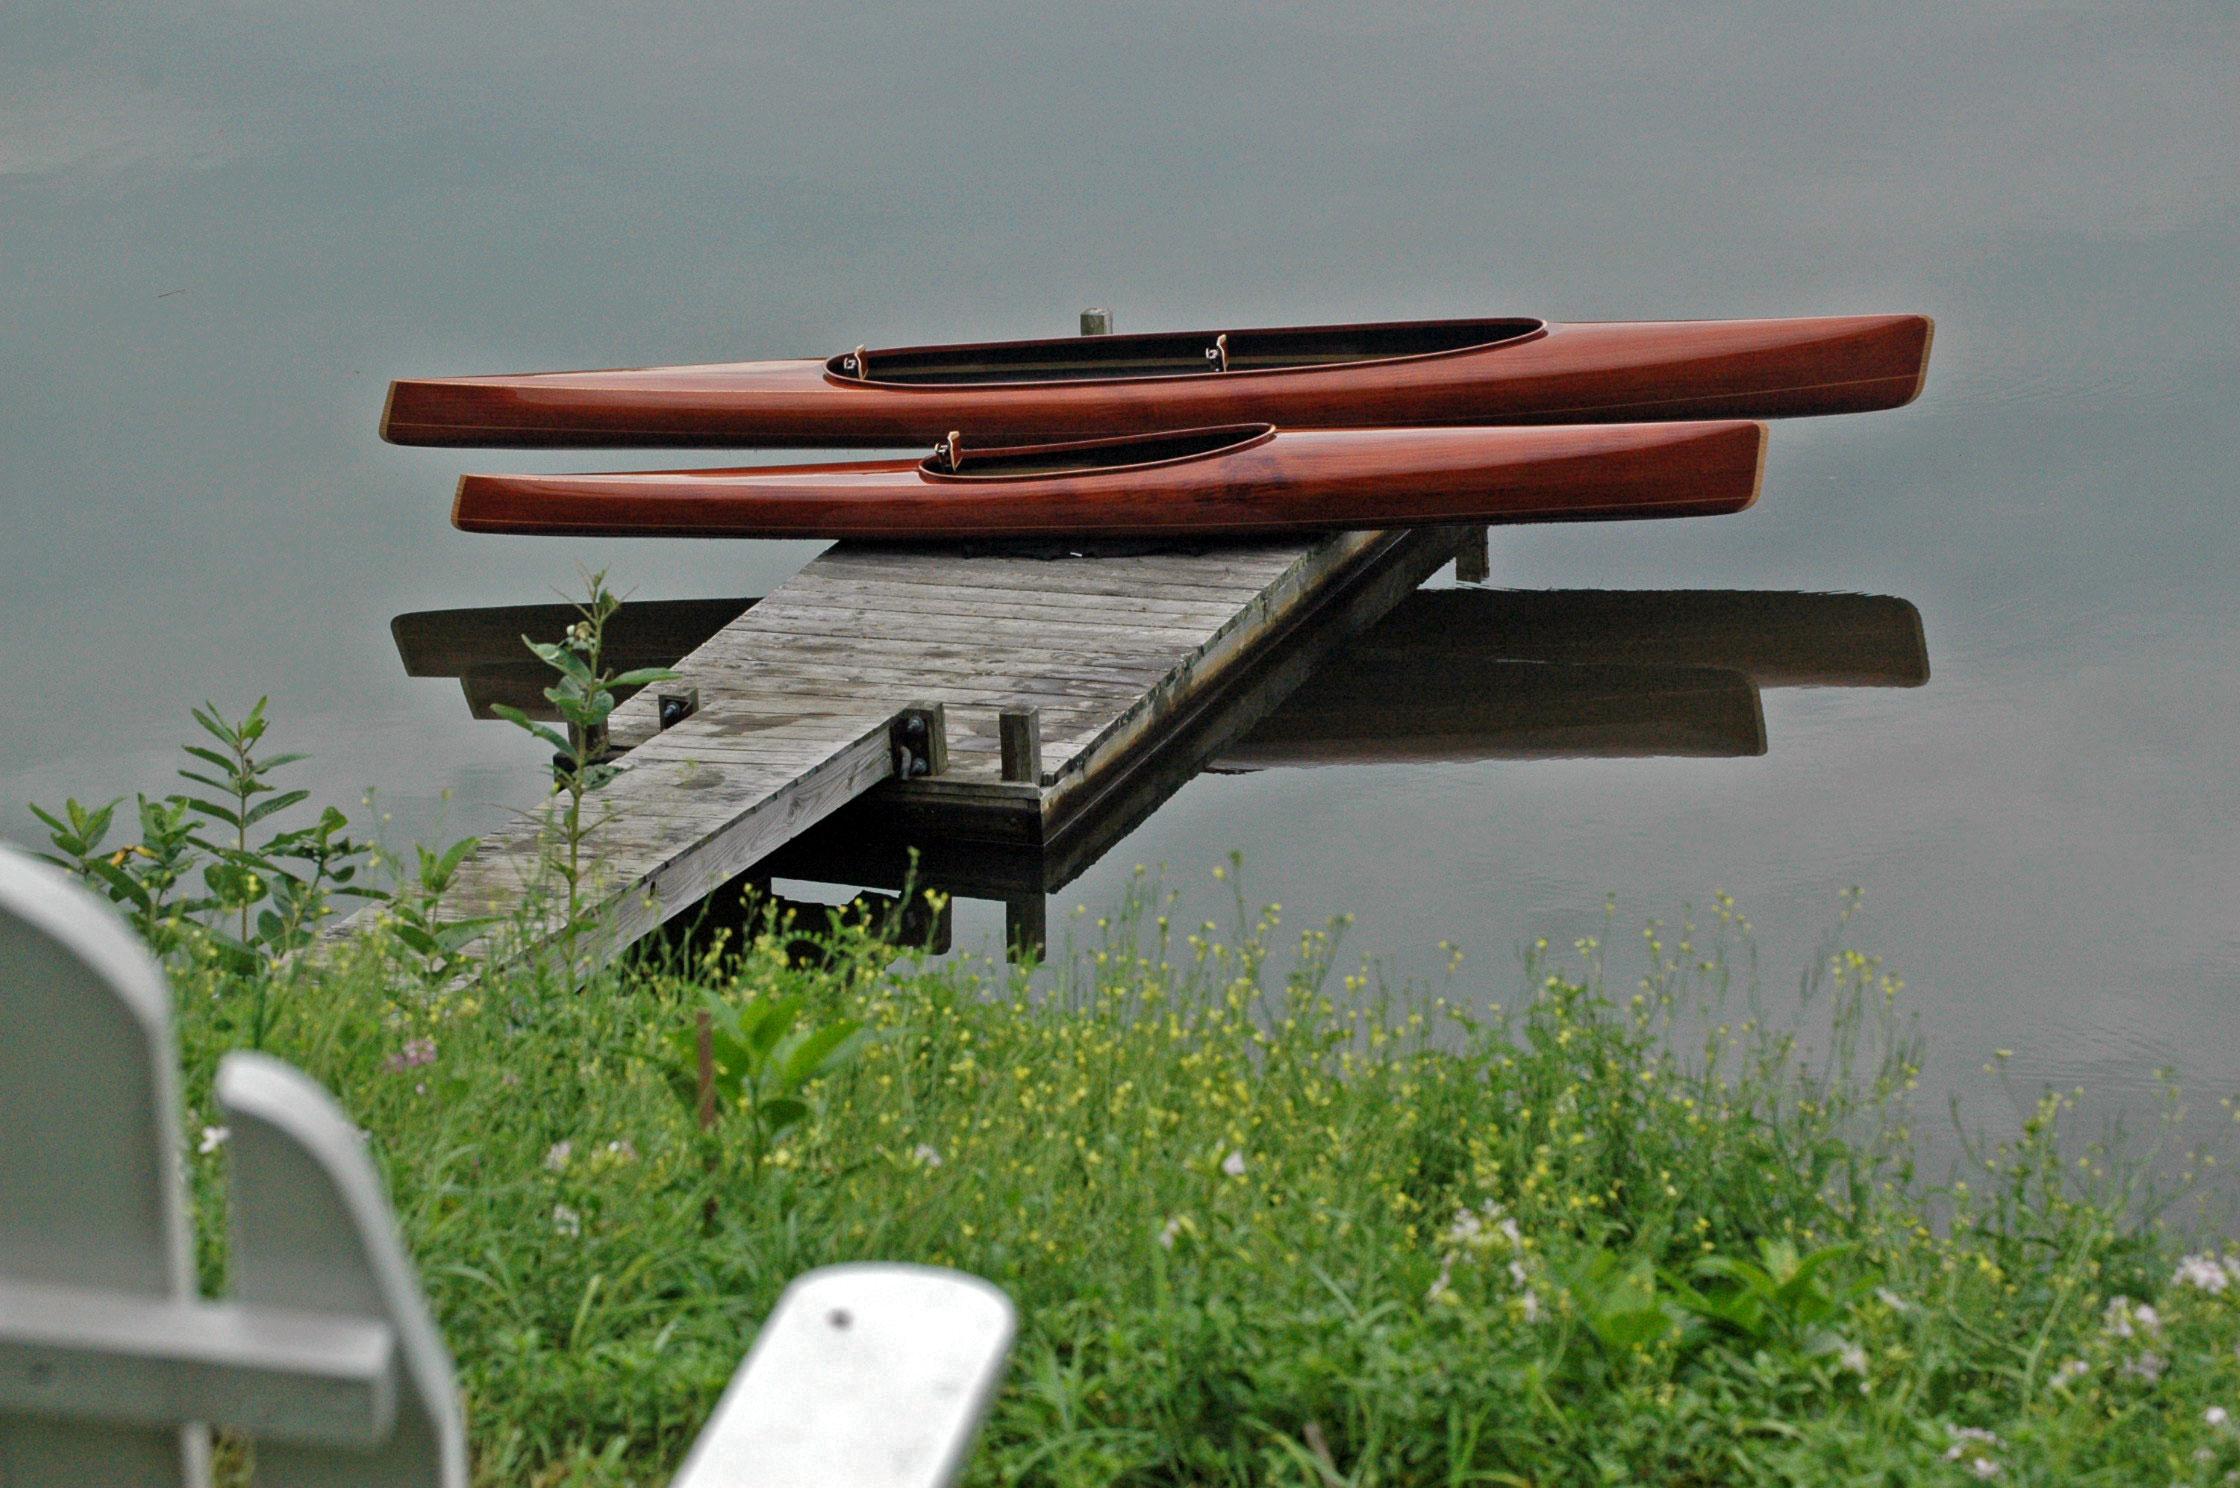 Solo and Tandem microBootlegger Mahogany Wooden Kayaks